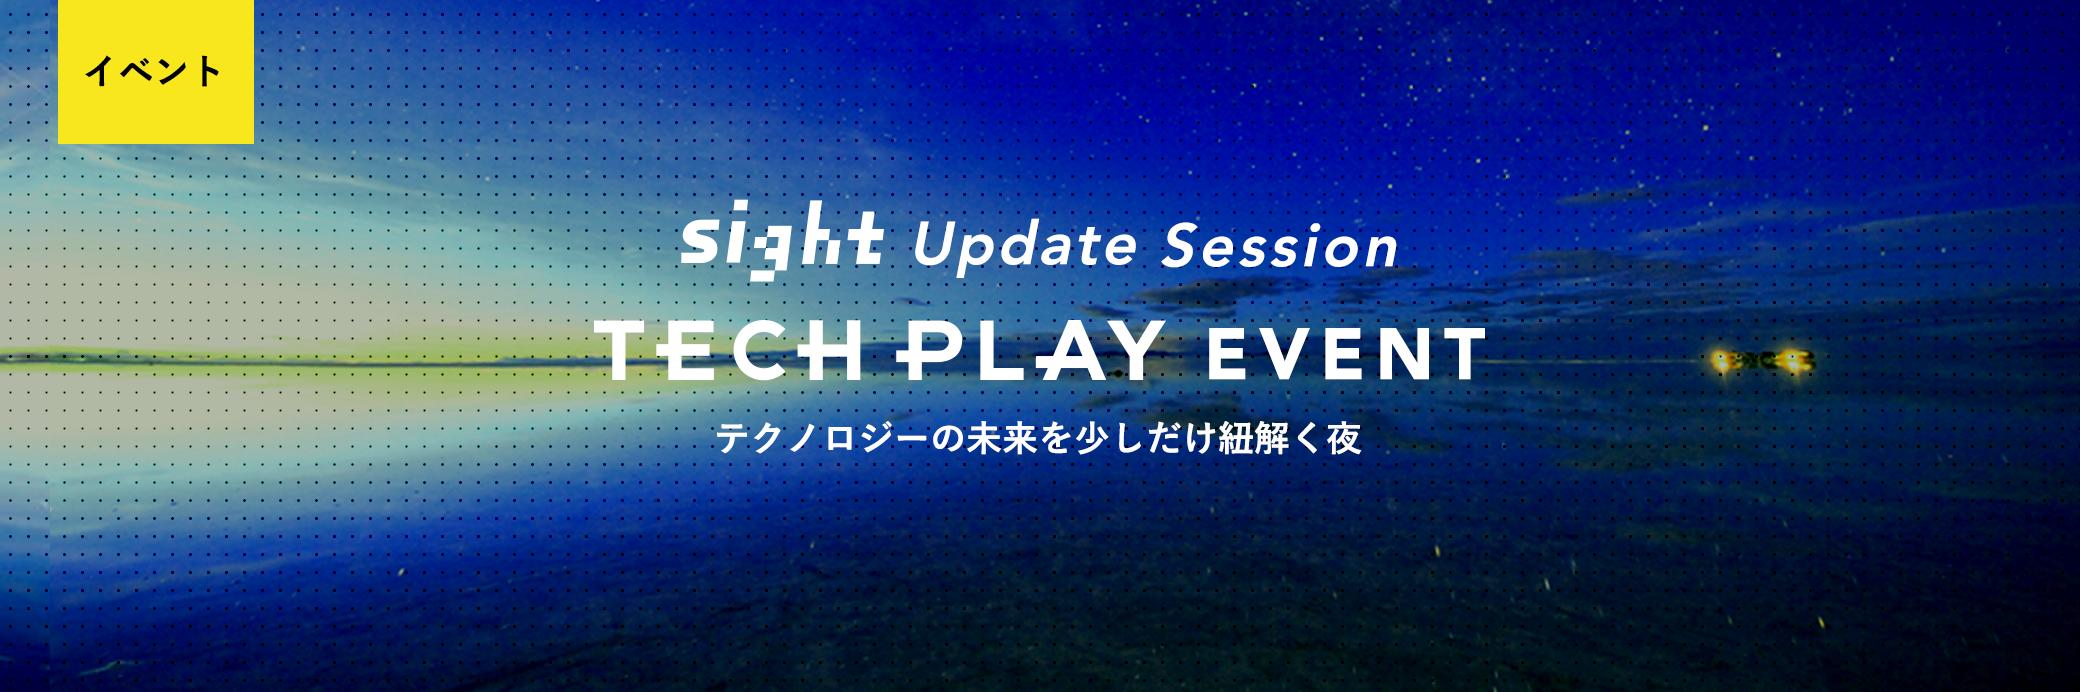 Technology sight Night  TECH PLAY EVENT  テクノロジーの未来を少しだけ紐解く夜